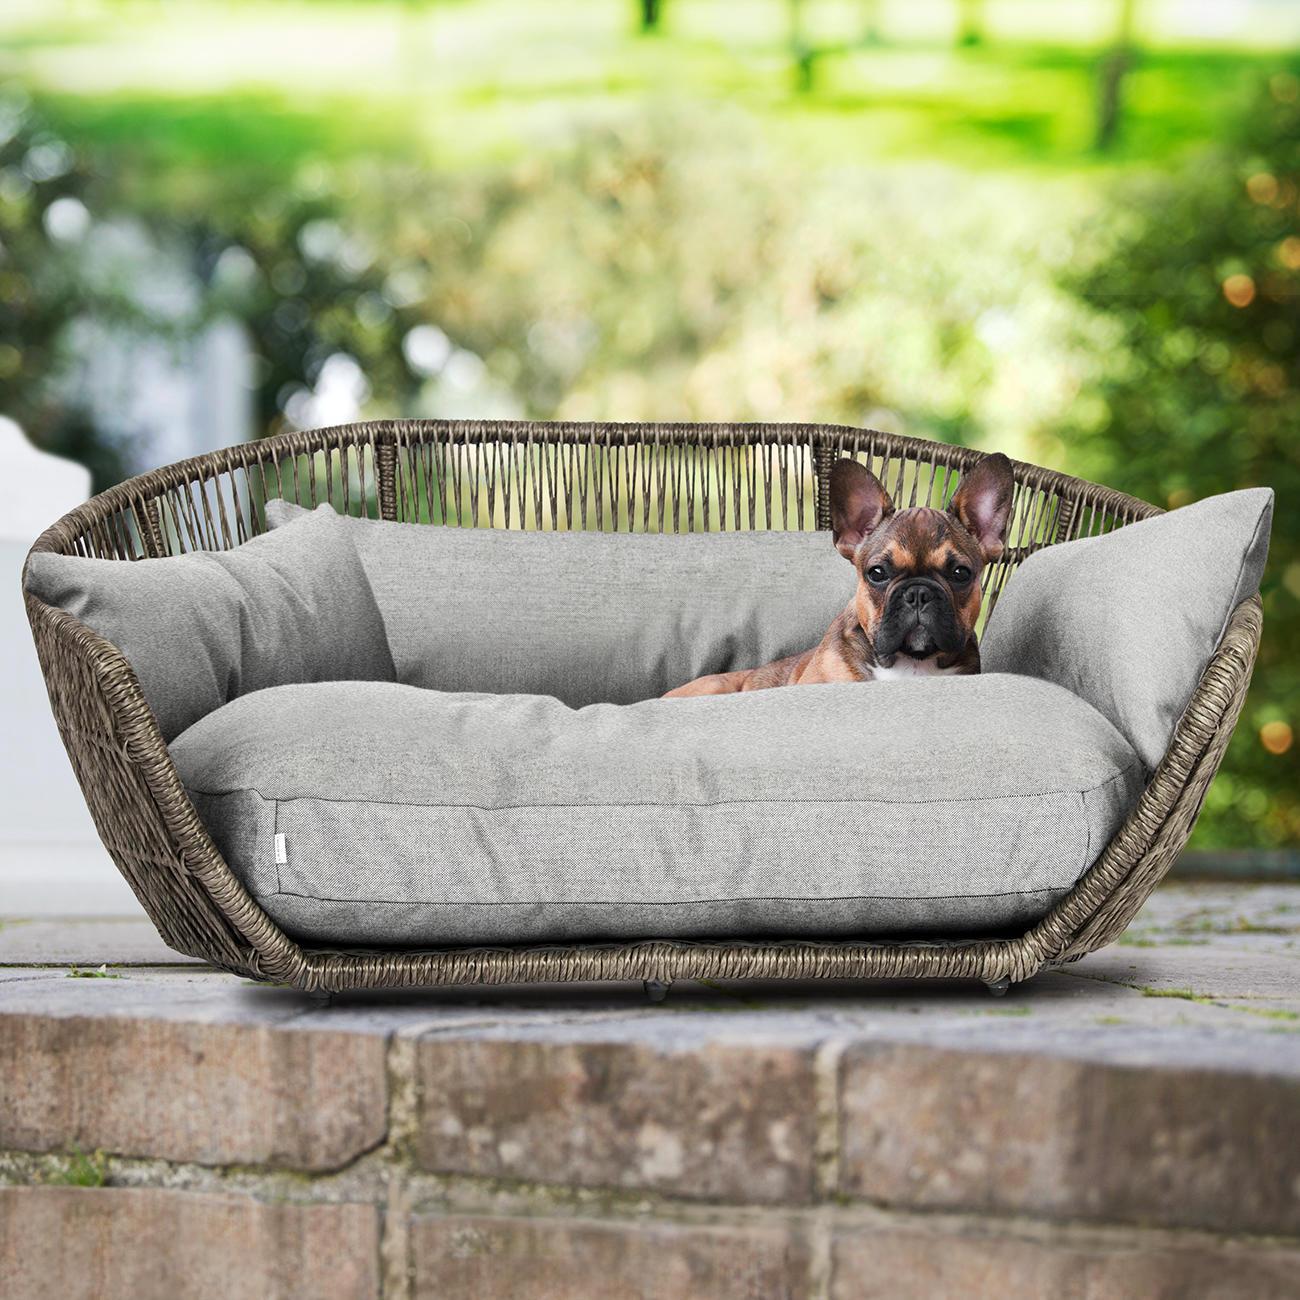 design hundebett 3 jahre garantie pro idee. Black Bedroom Furniture Sets. Home Design Ideas